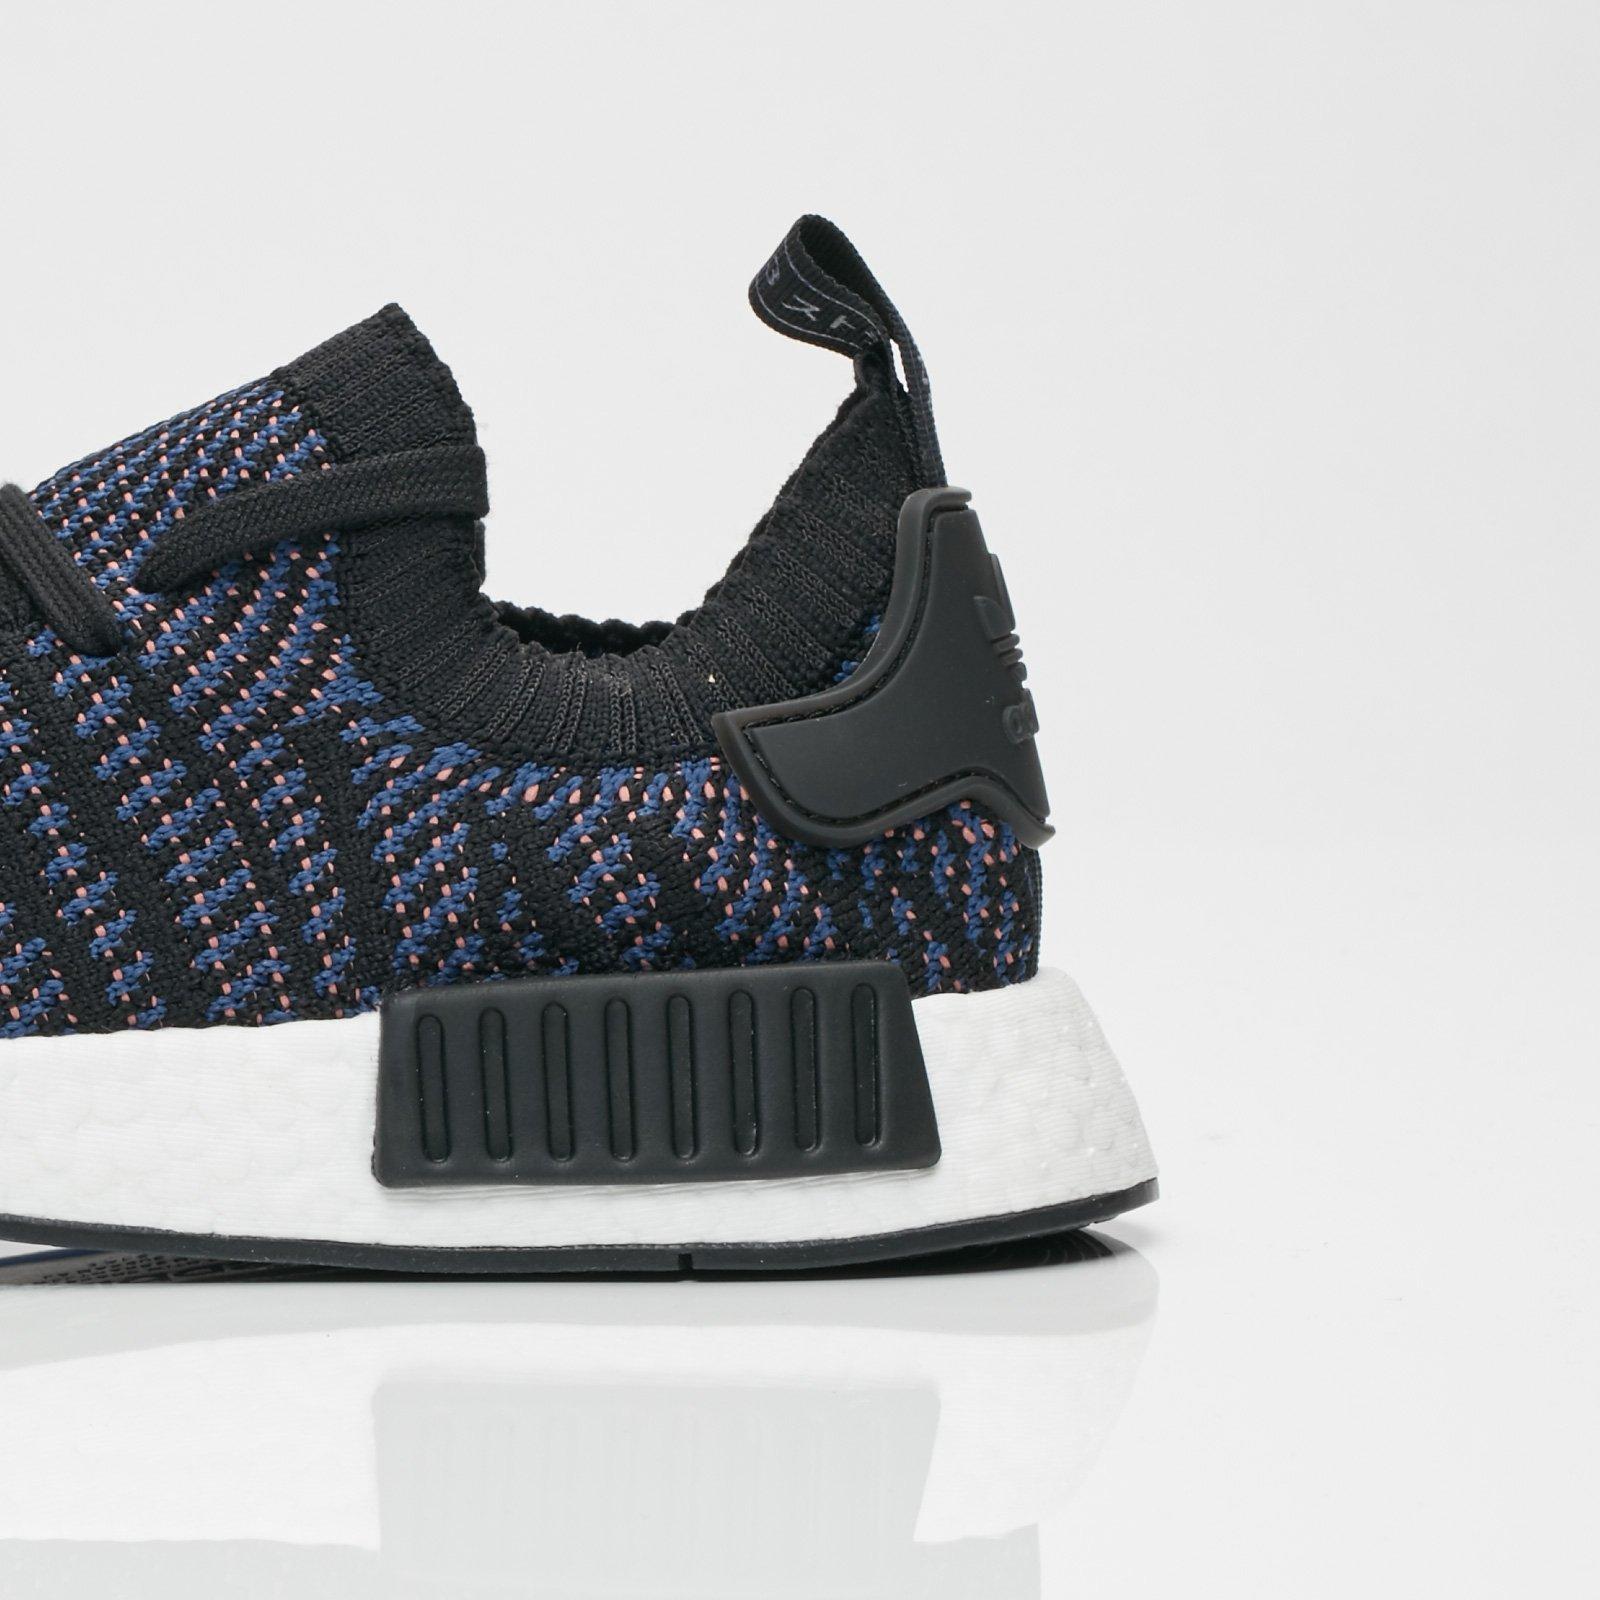 3870e51b70ab adidas NMD R1 STLT PK W - Ac8326 - Sneakersnstuff